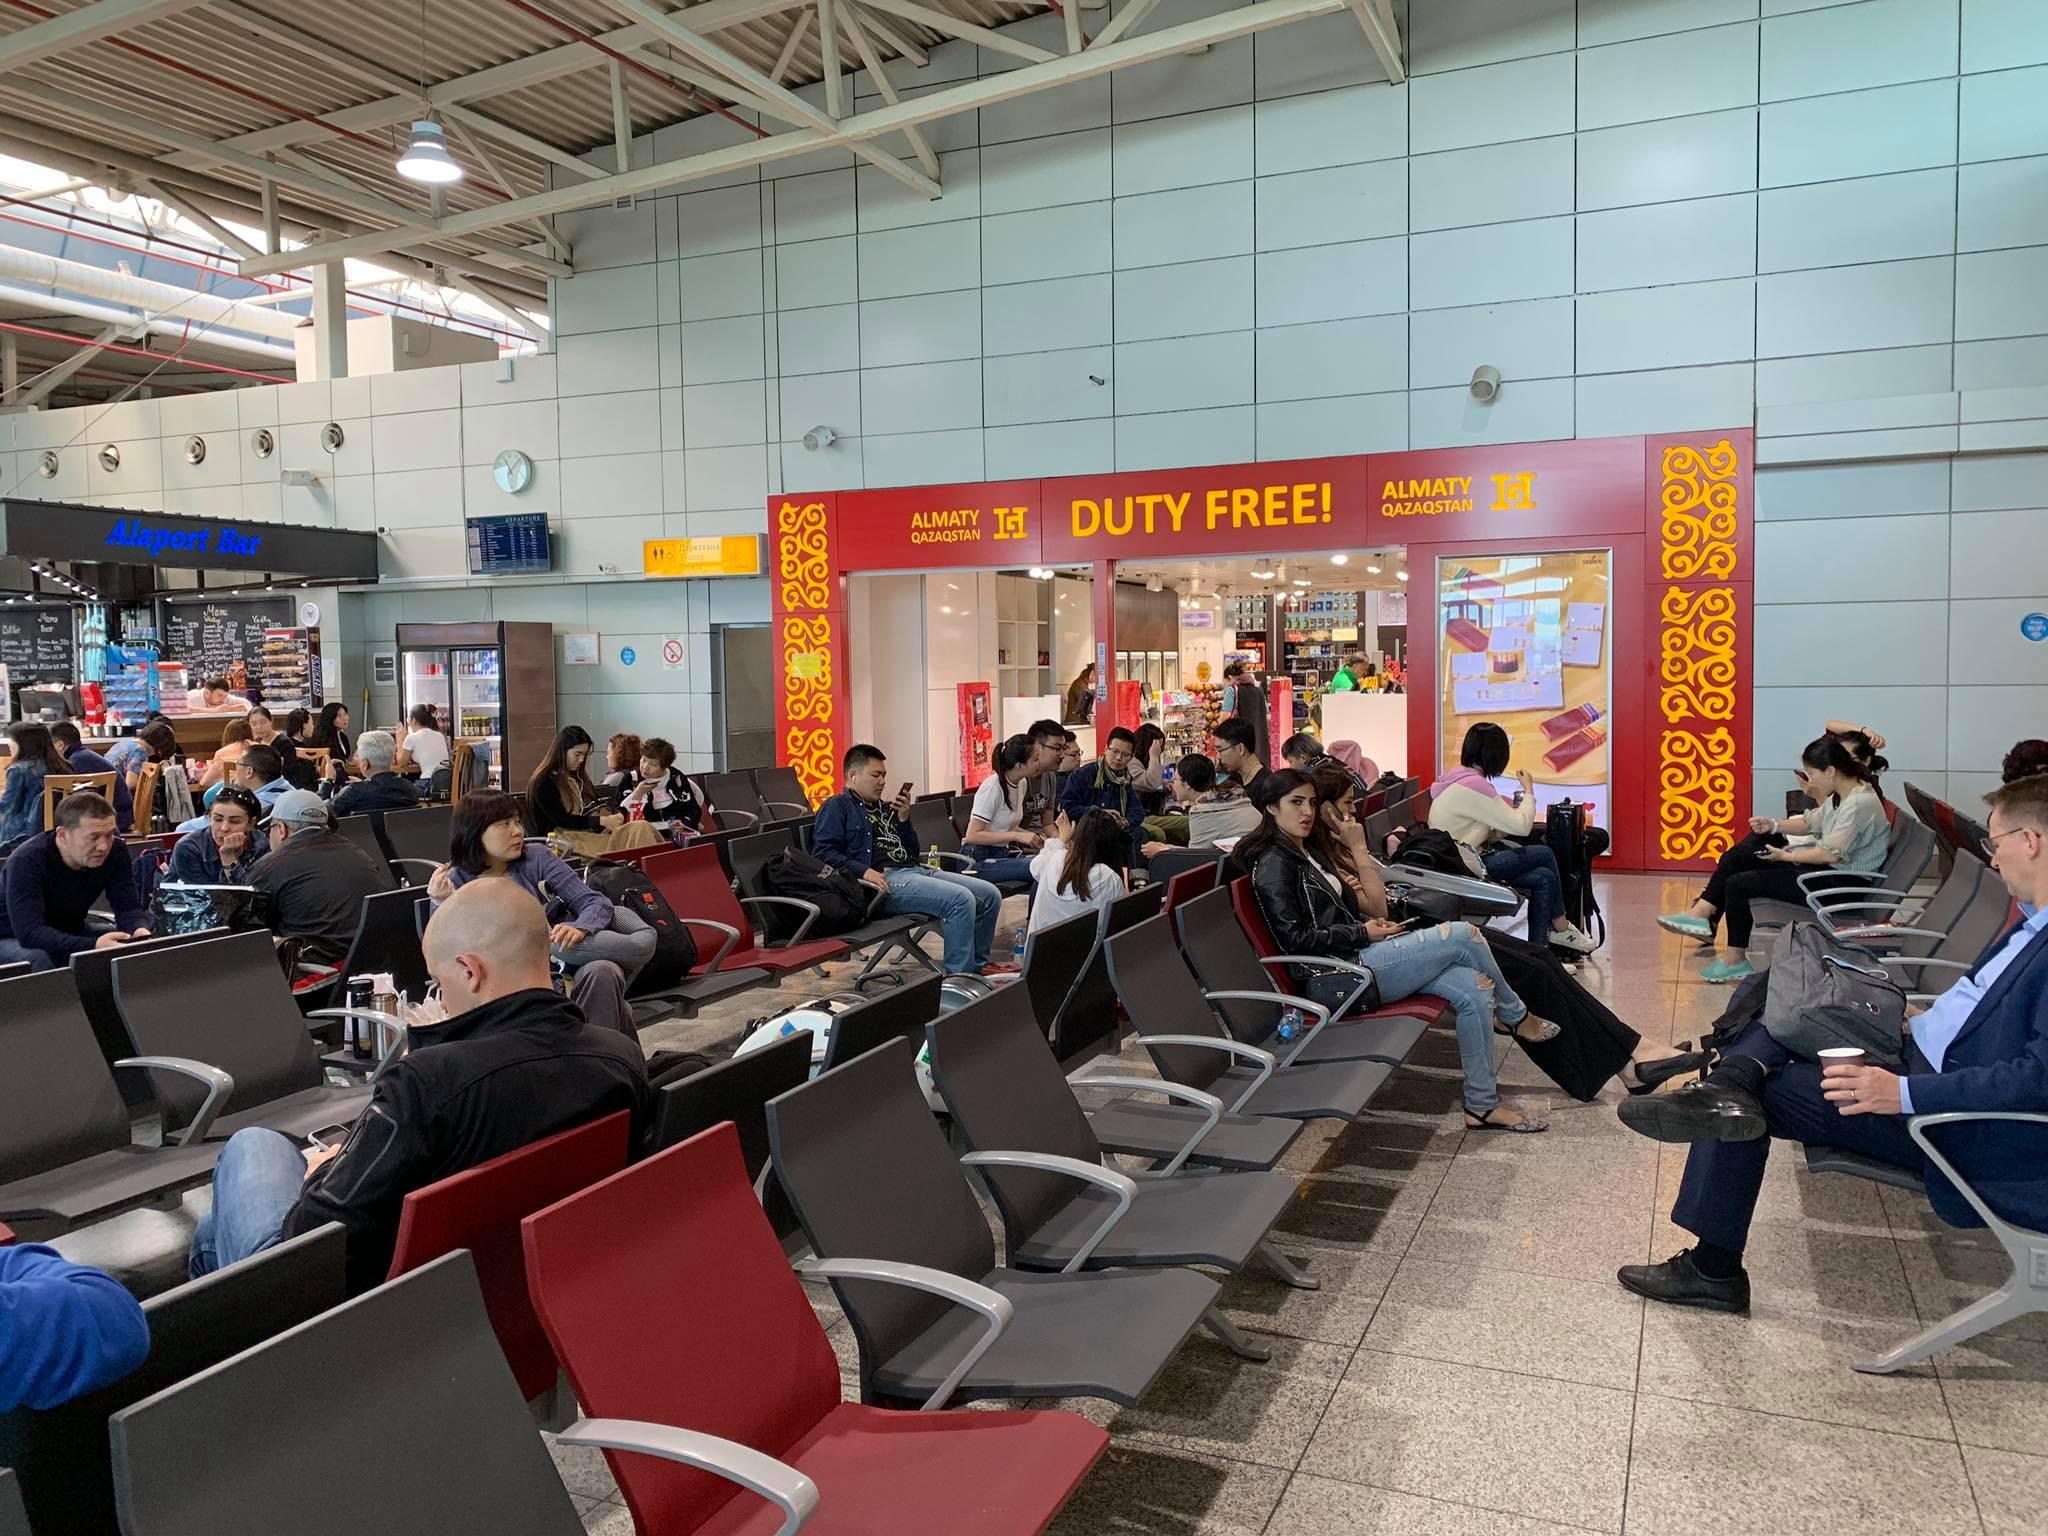 Kach Solo Travels in 2019 I just arrived in Dushanbe, Tajikistan9.jpg